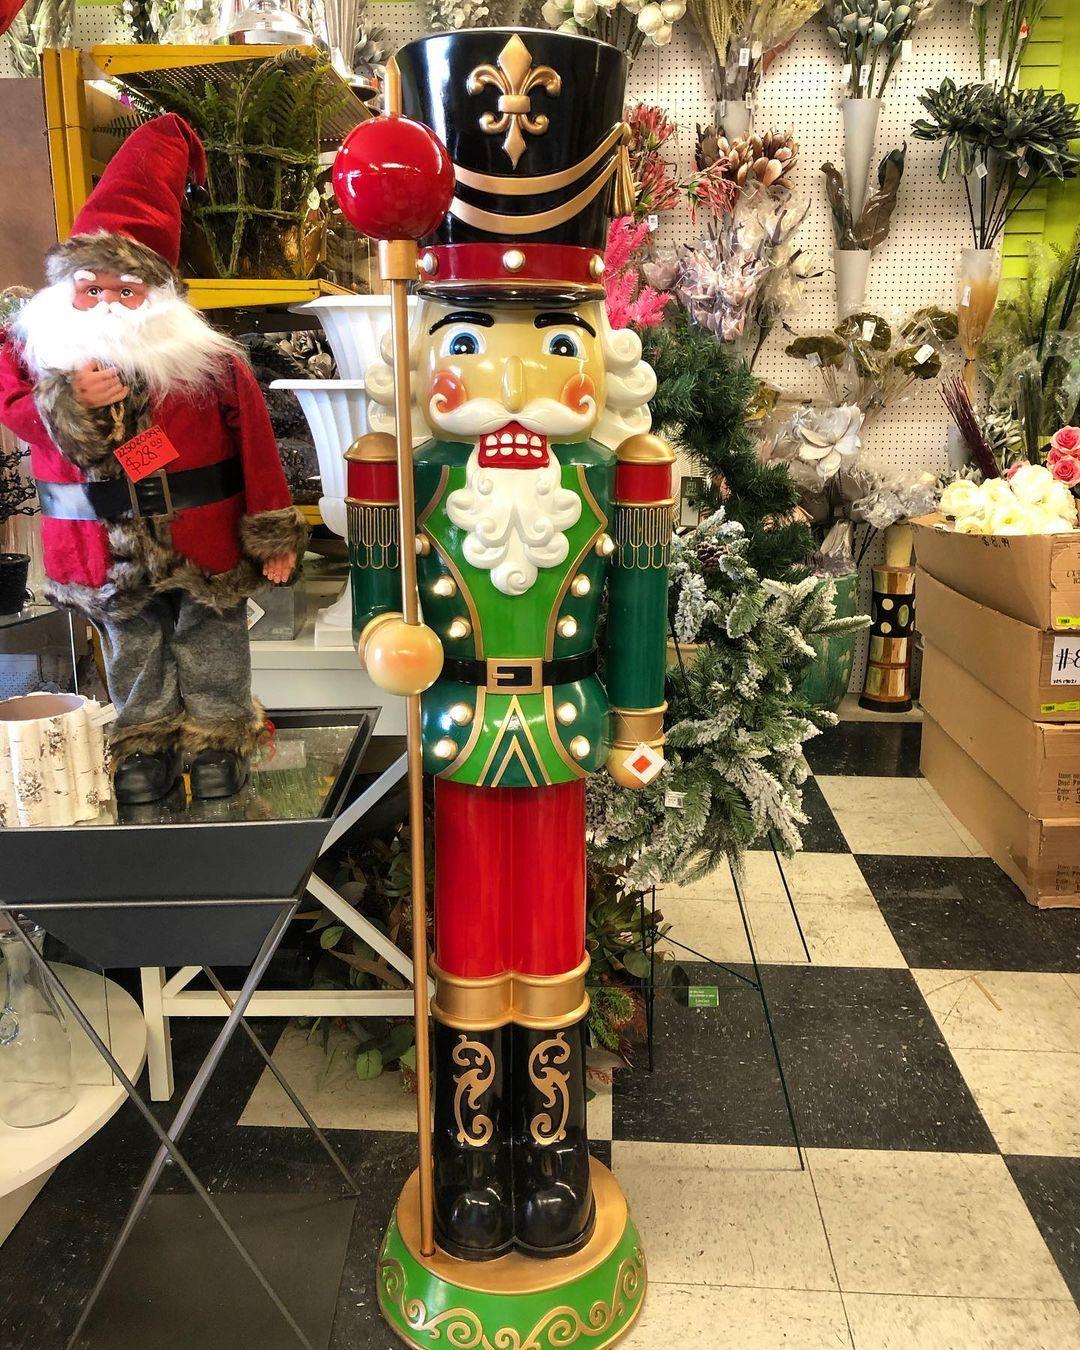 𝘉𝘦𝘢𝘶𝘵𝘪𝘧𝘶𝘭 𝙉𝙪𝙩𝙘𝙧𝙖𝙘𝙠𝙚𝙧 to decorate your home . . . . . . #homedecor #shoplocal #supportsmallbusiness #artificialflowers #christmas #christmasdecor #nutcracker #christmasvibes #laredotexas